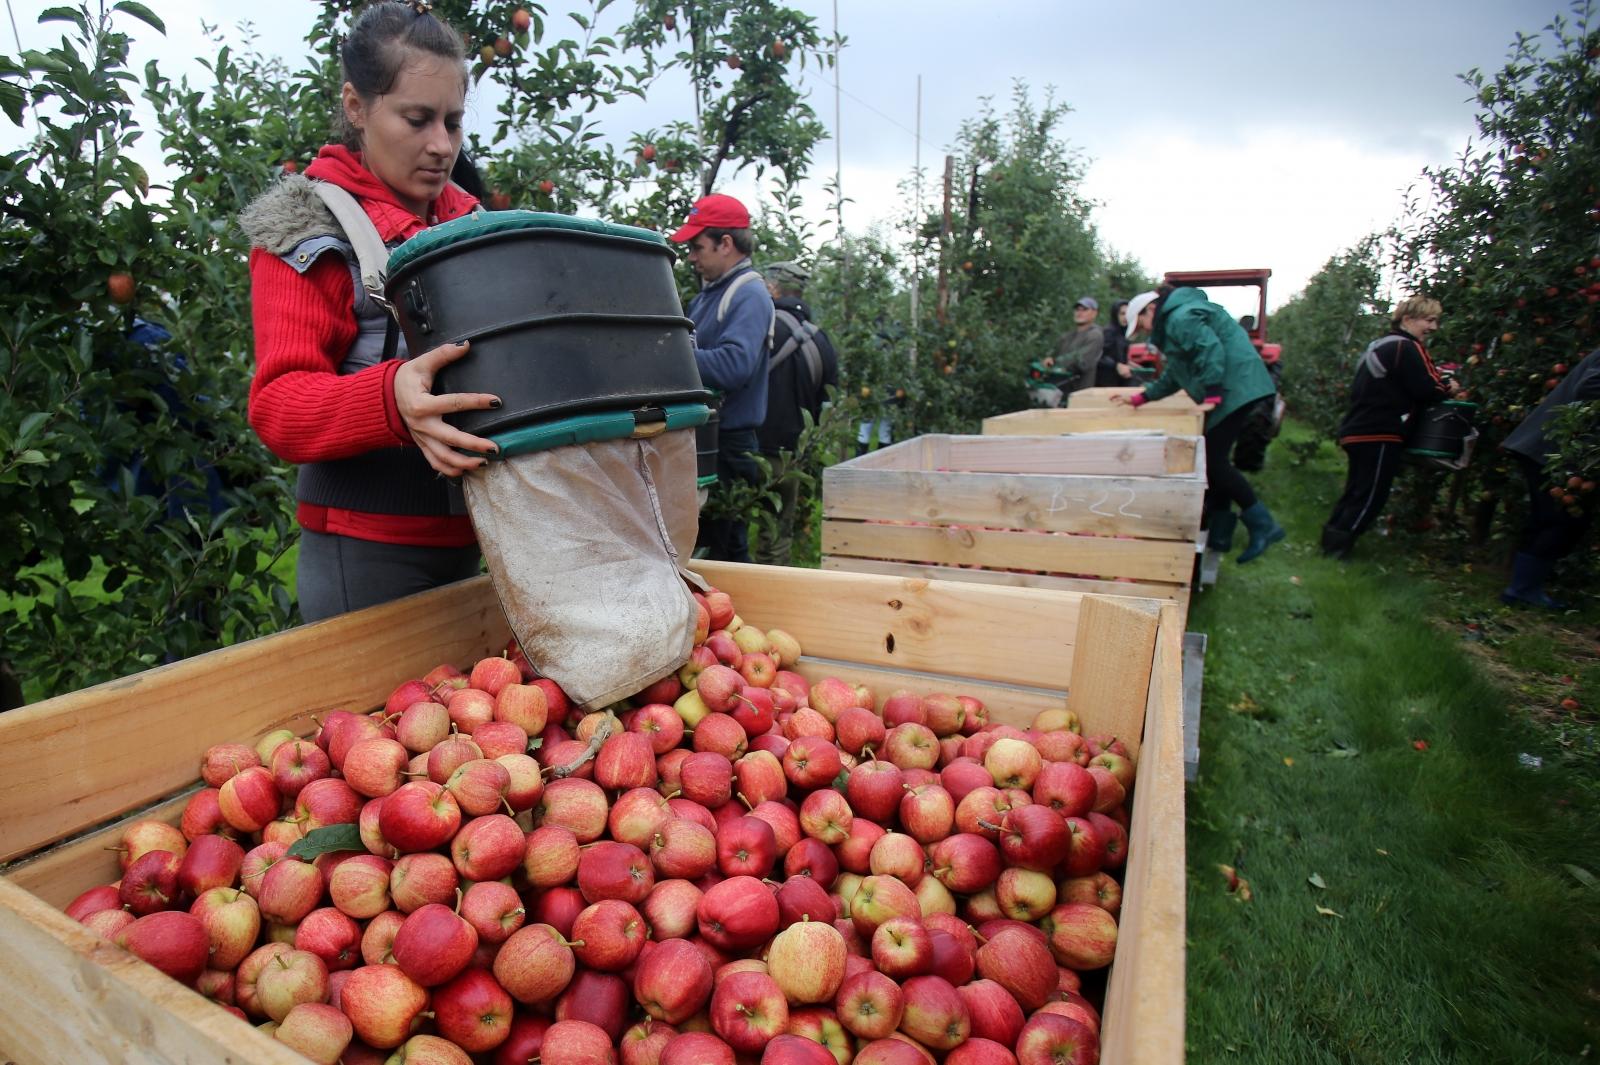 British fruit pickers